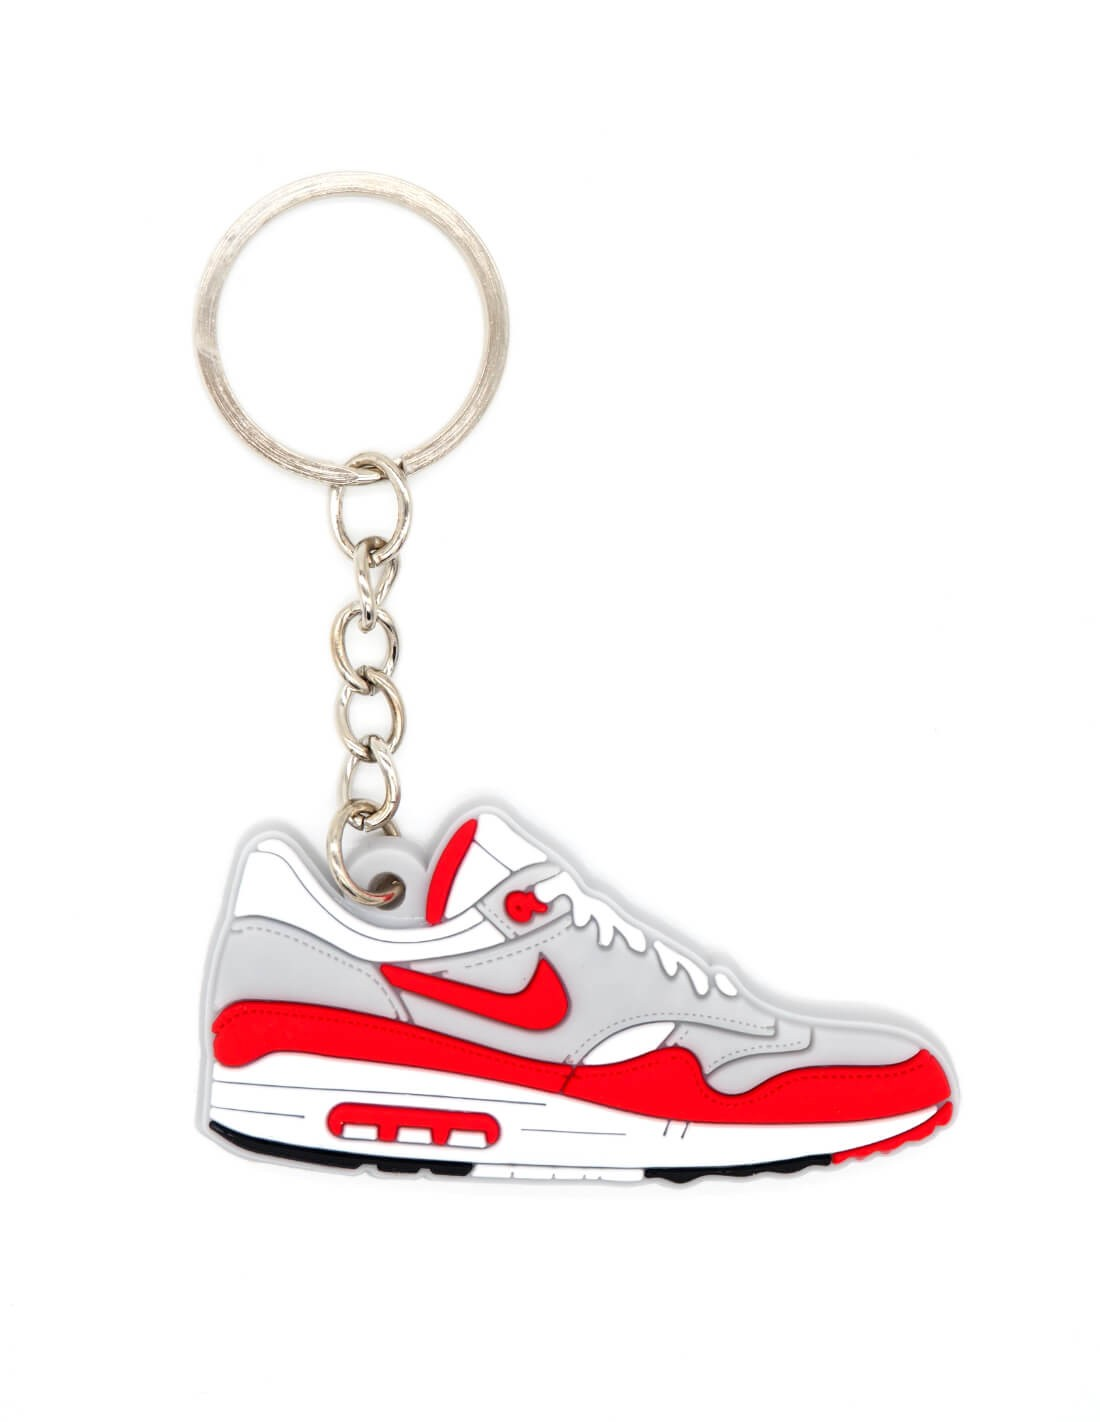 Porte clé Nike air max 1 og red | Fskorp